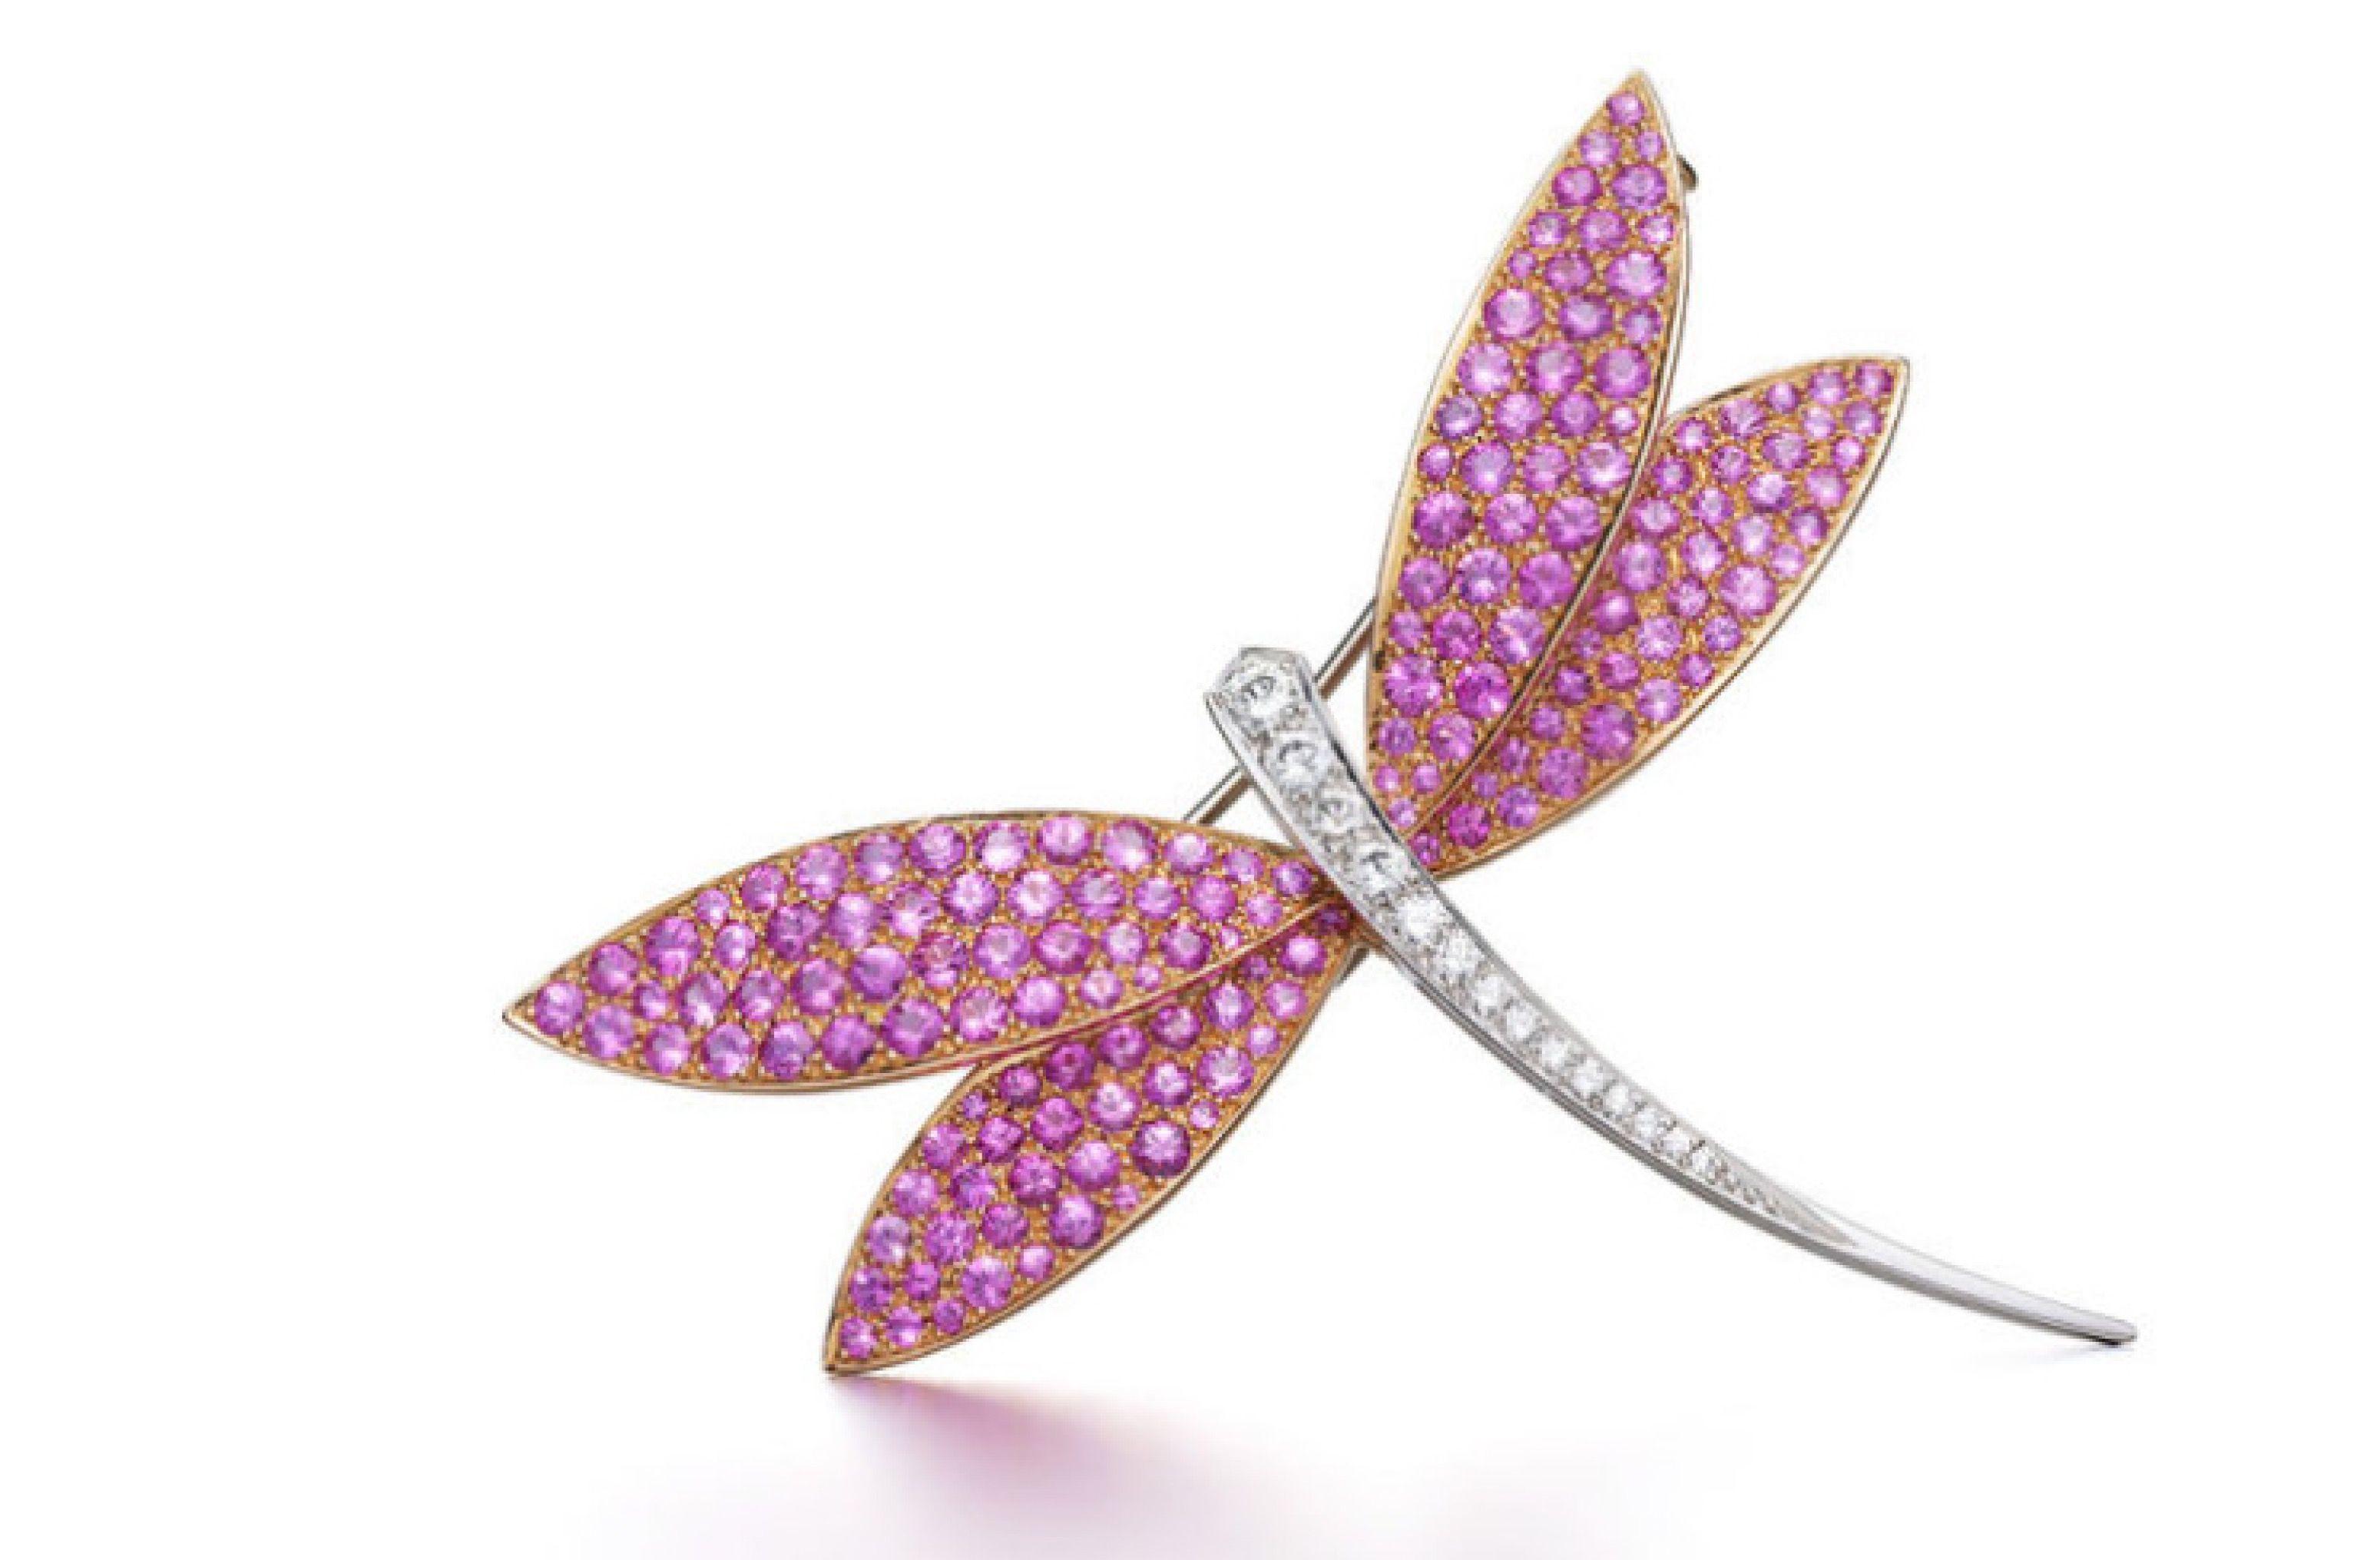 JewelryWhite_02.jpg